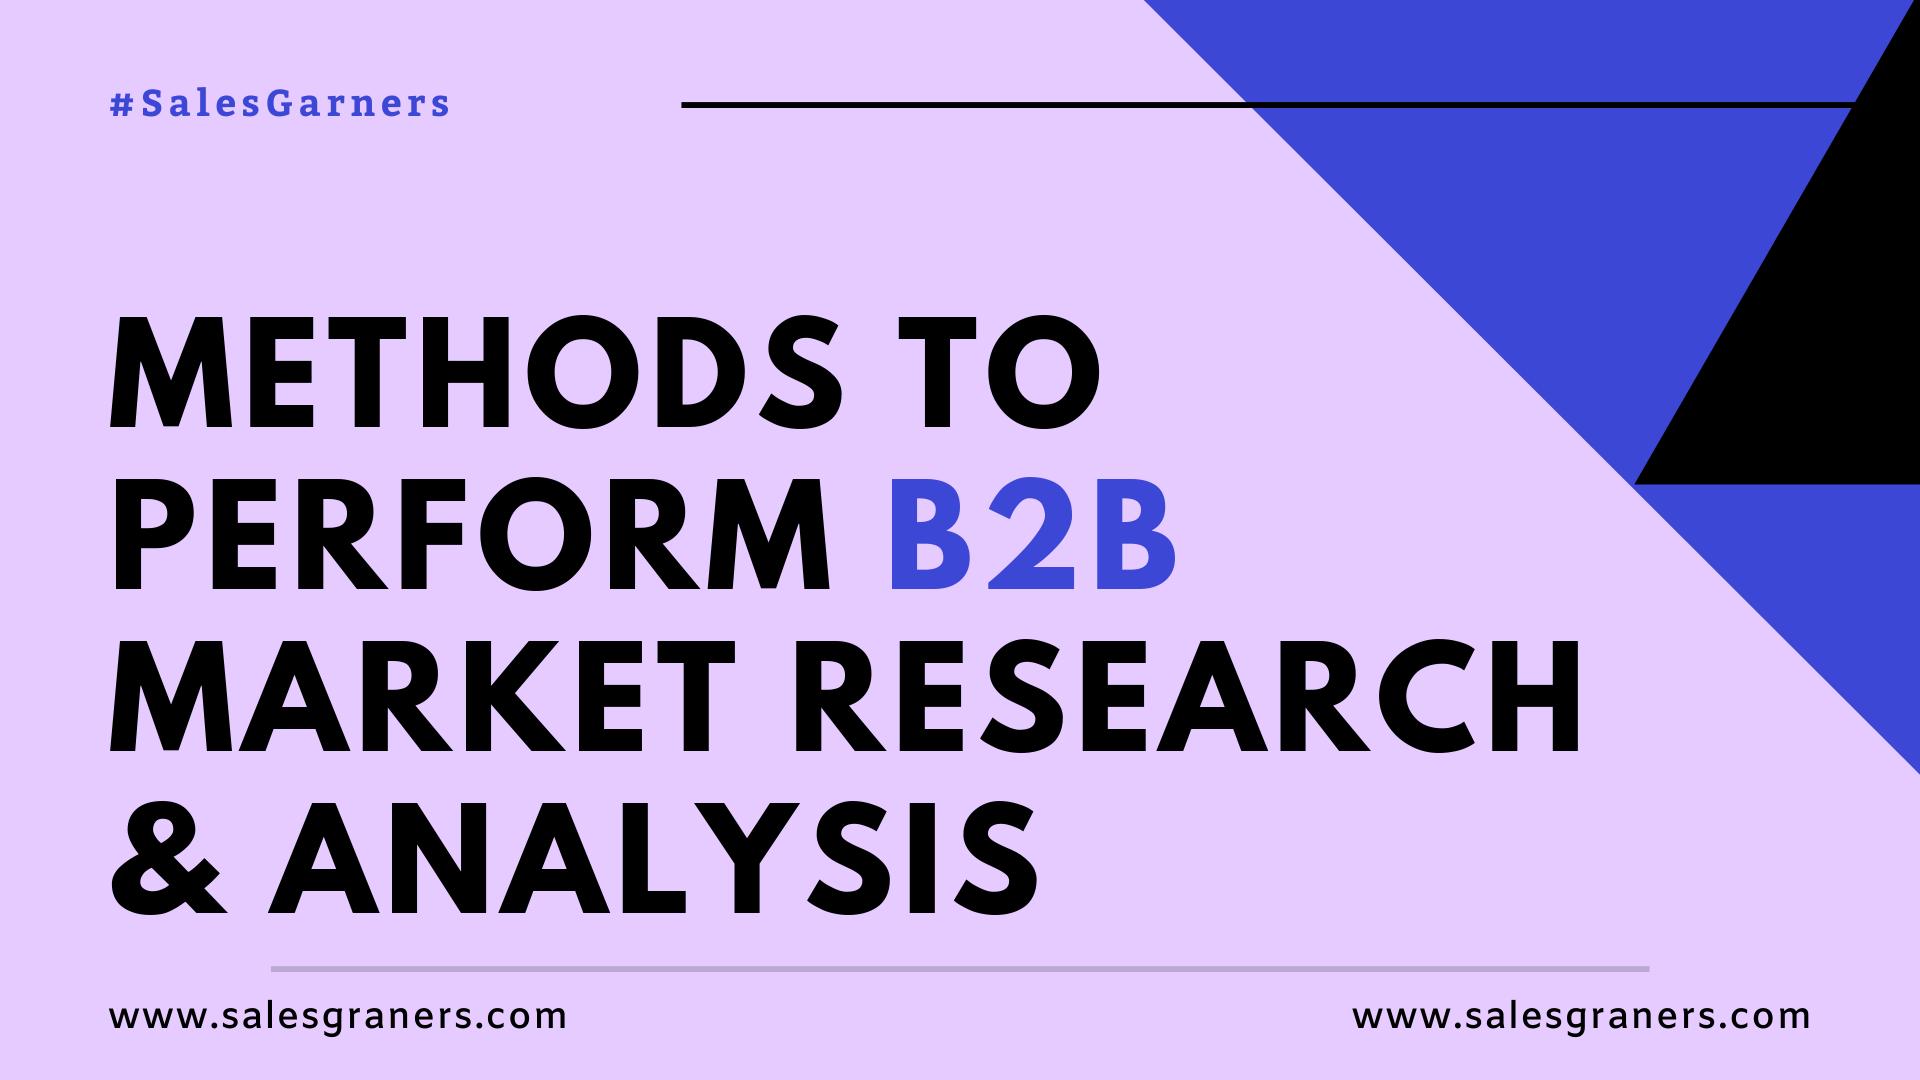 Methods to Perform B2B Market Research & Analysis